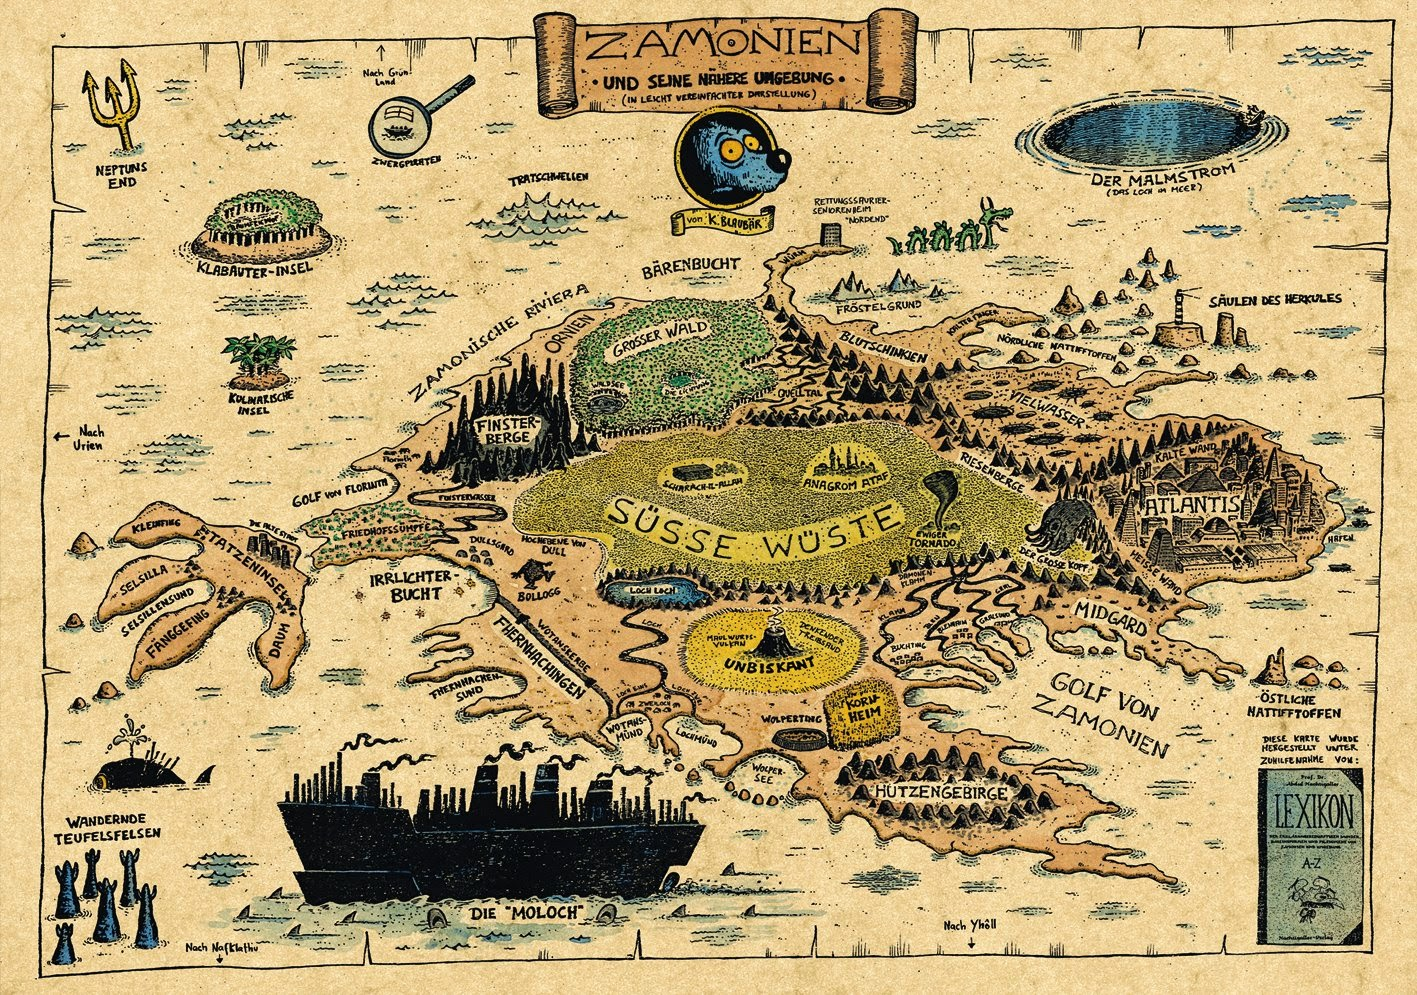 zamonien karte Landkartenblog: Käpt´n Blaubärs sagenumwobenes Zamonien